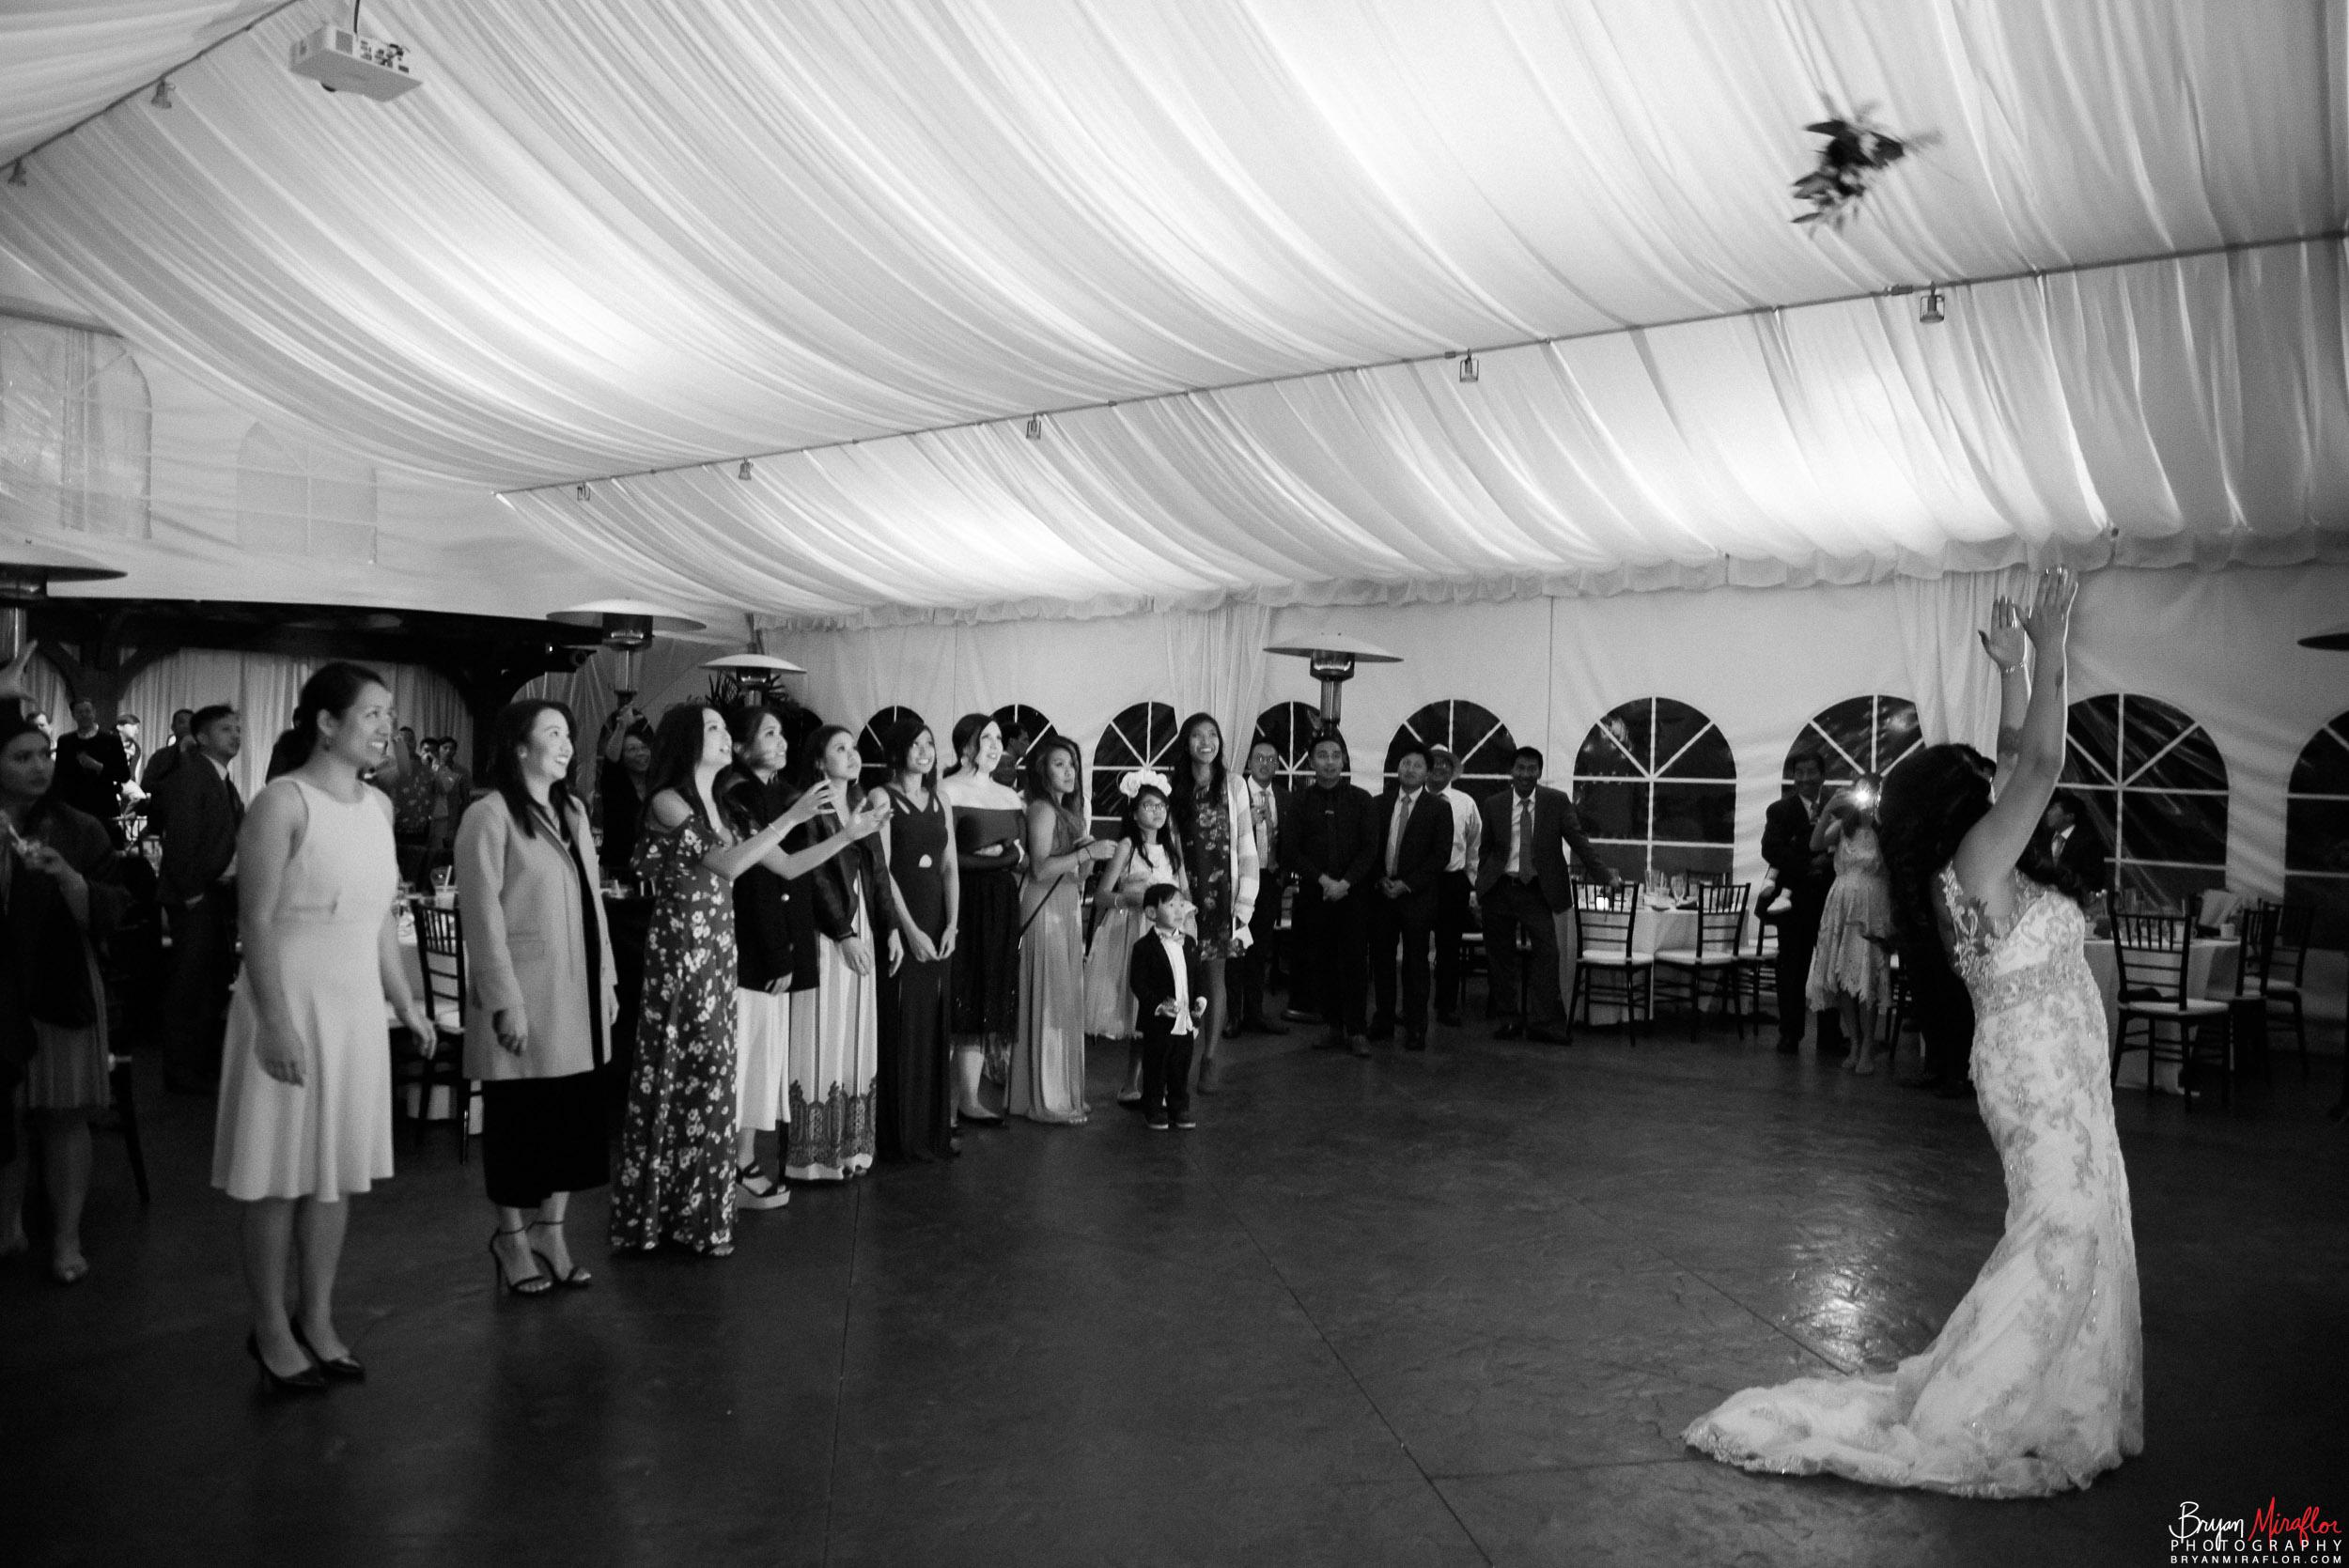 Bryan-Miraflor-Photography-Hannah-Jonathan-Married-Grand-Traditions-Estate-Gardens-Fallbrook-20171222-206.jpg